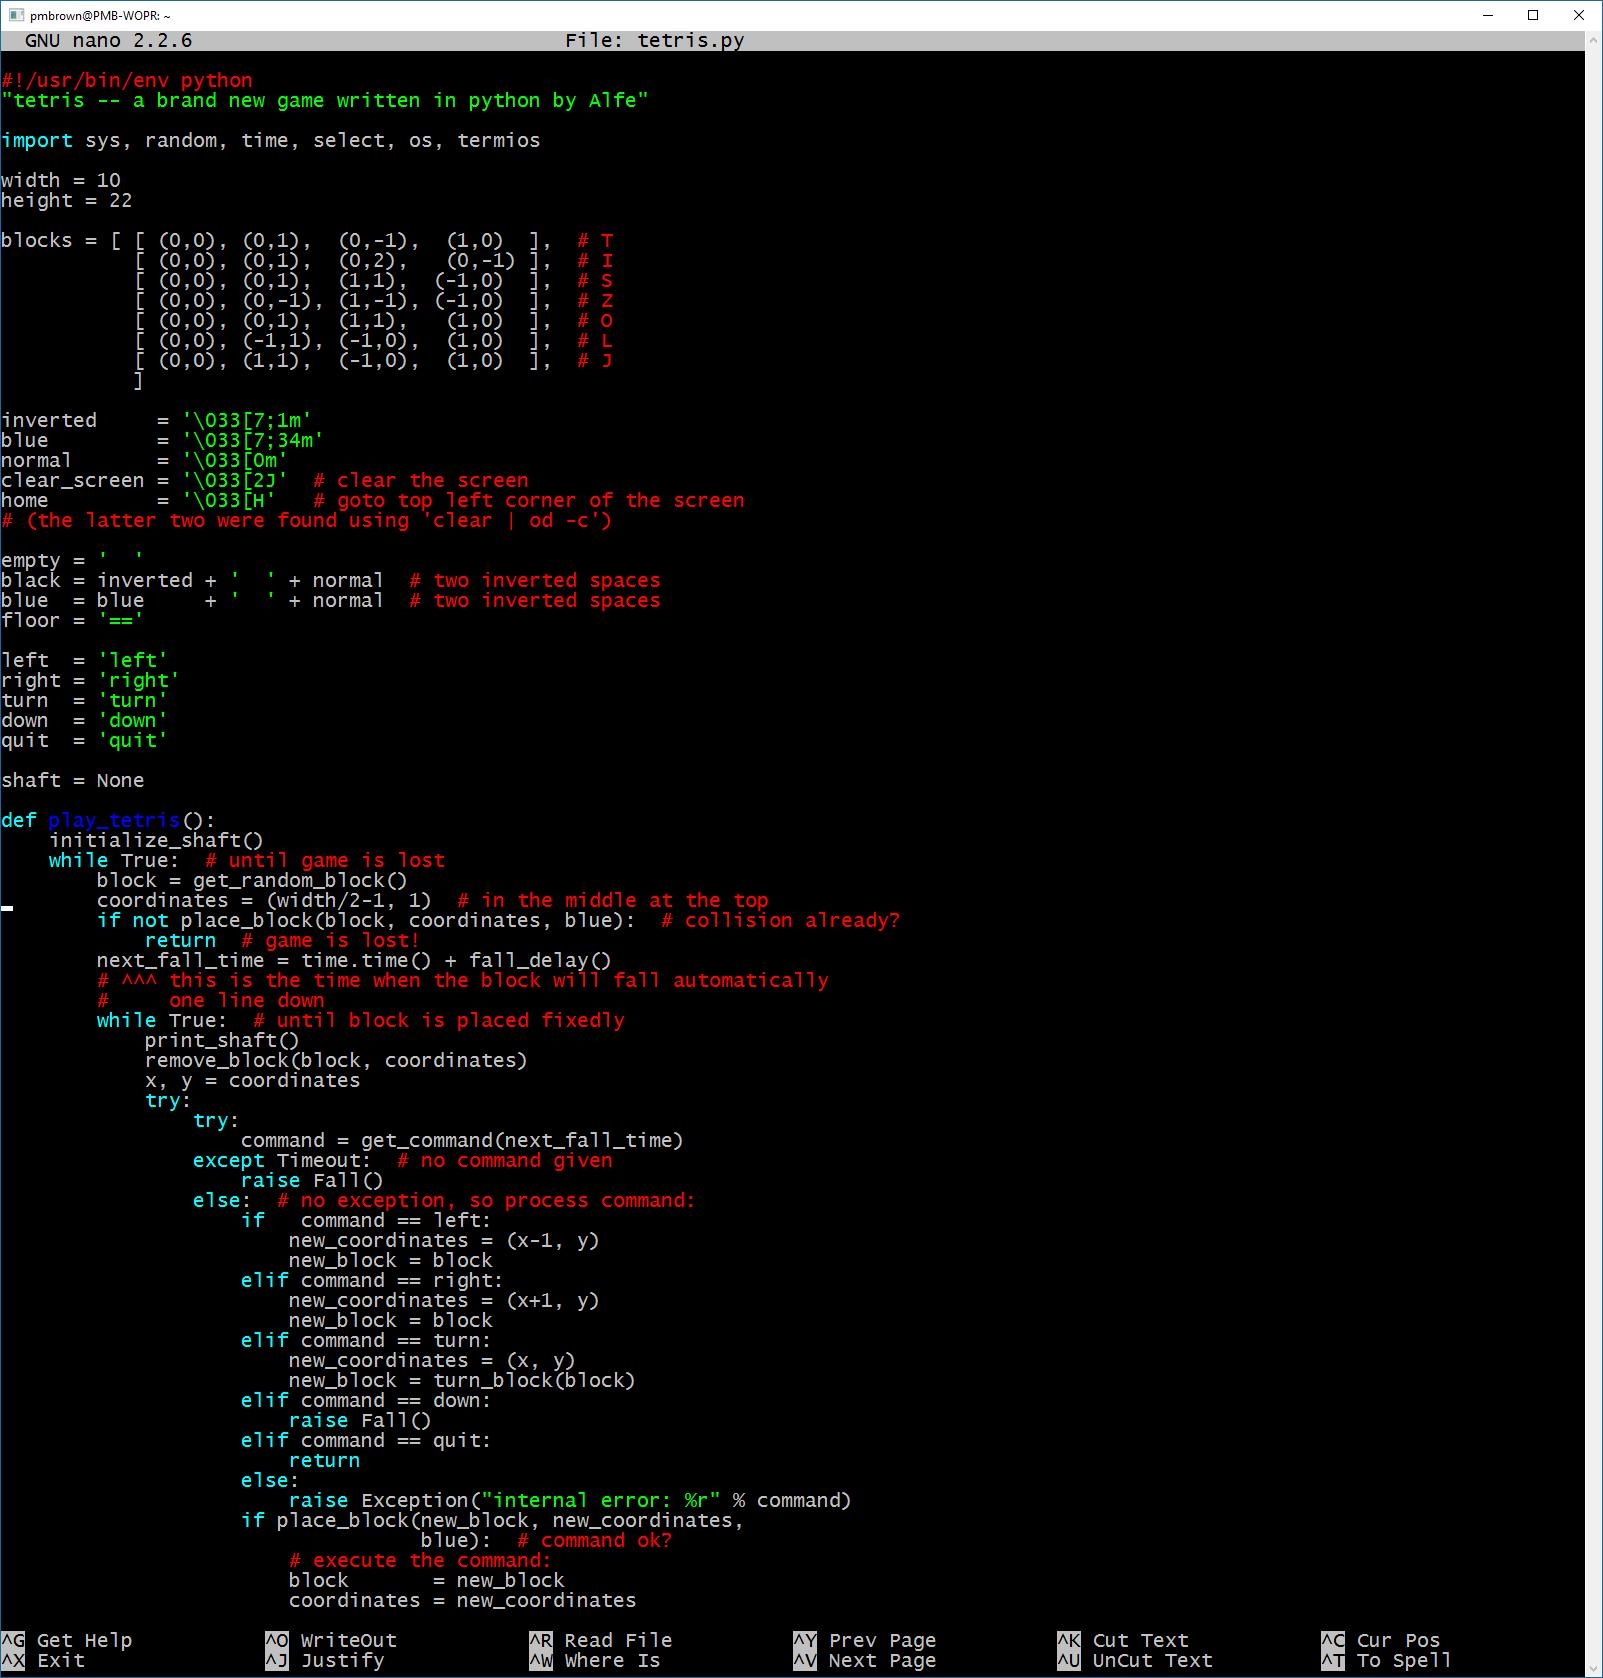 275 lines of Python code